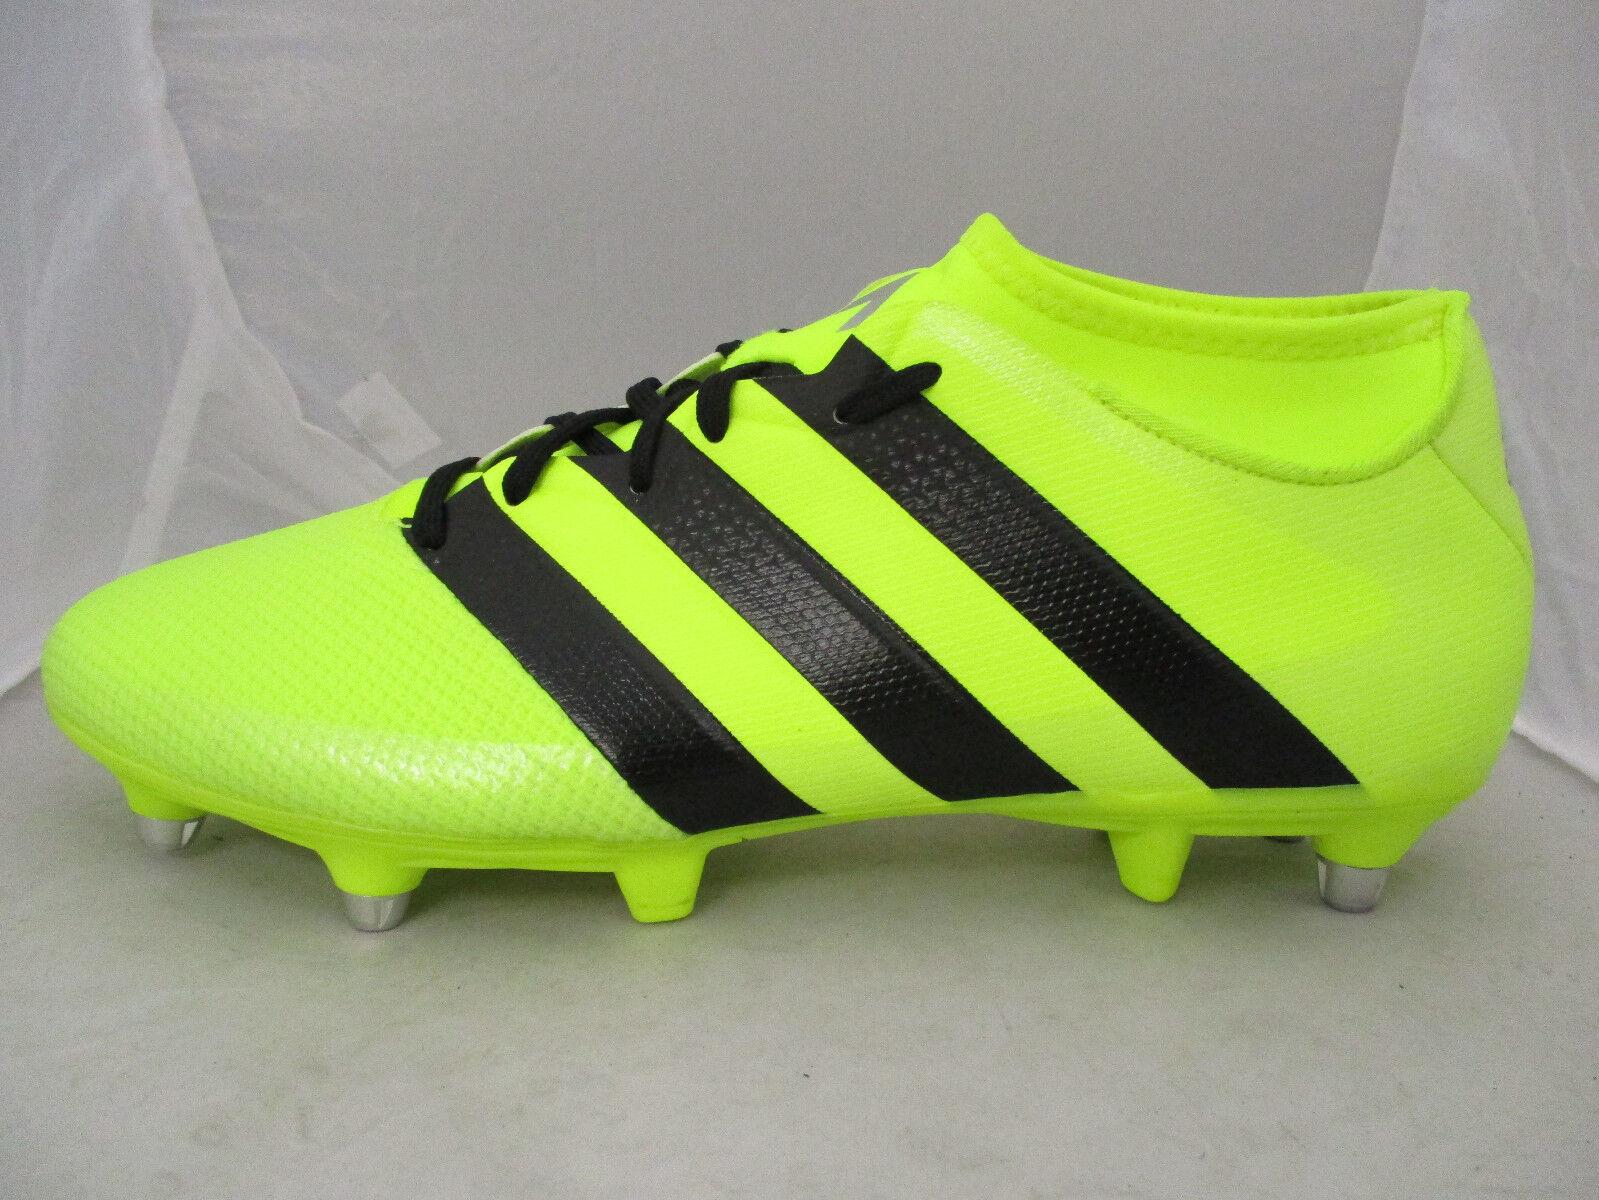 Adidas Ace 16.3 Primemesh SG Mens Football US 10.5 /3 R 3359^ Brand discount